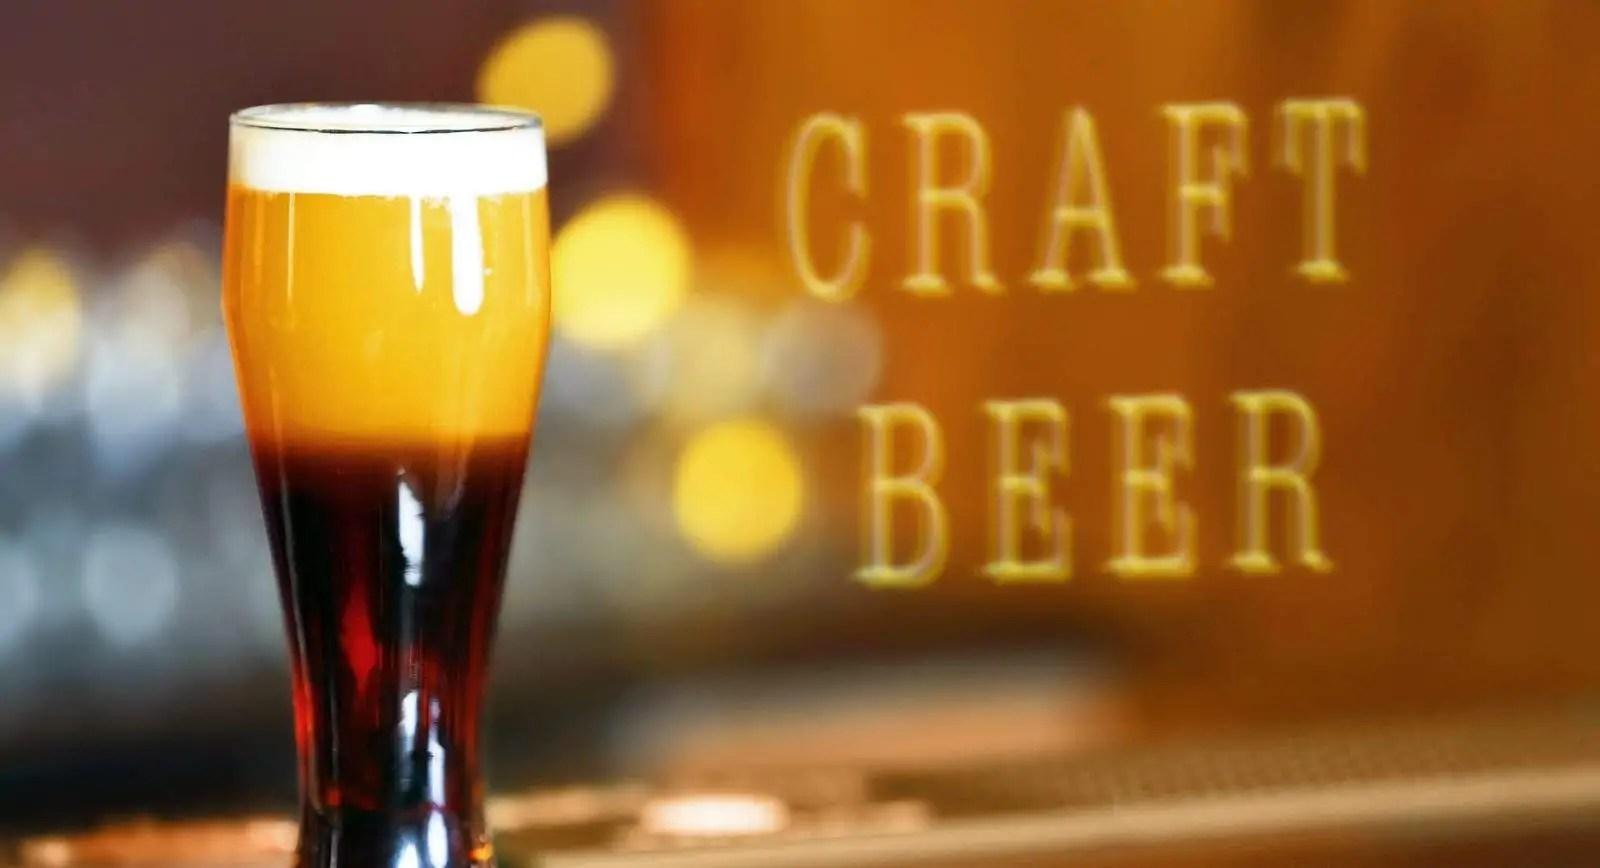 Craft beer, fresh beer